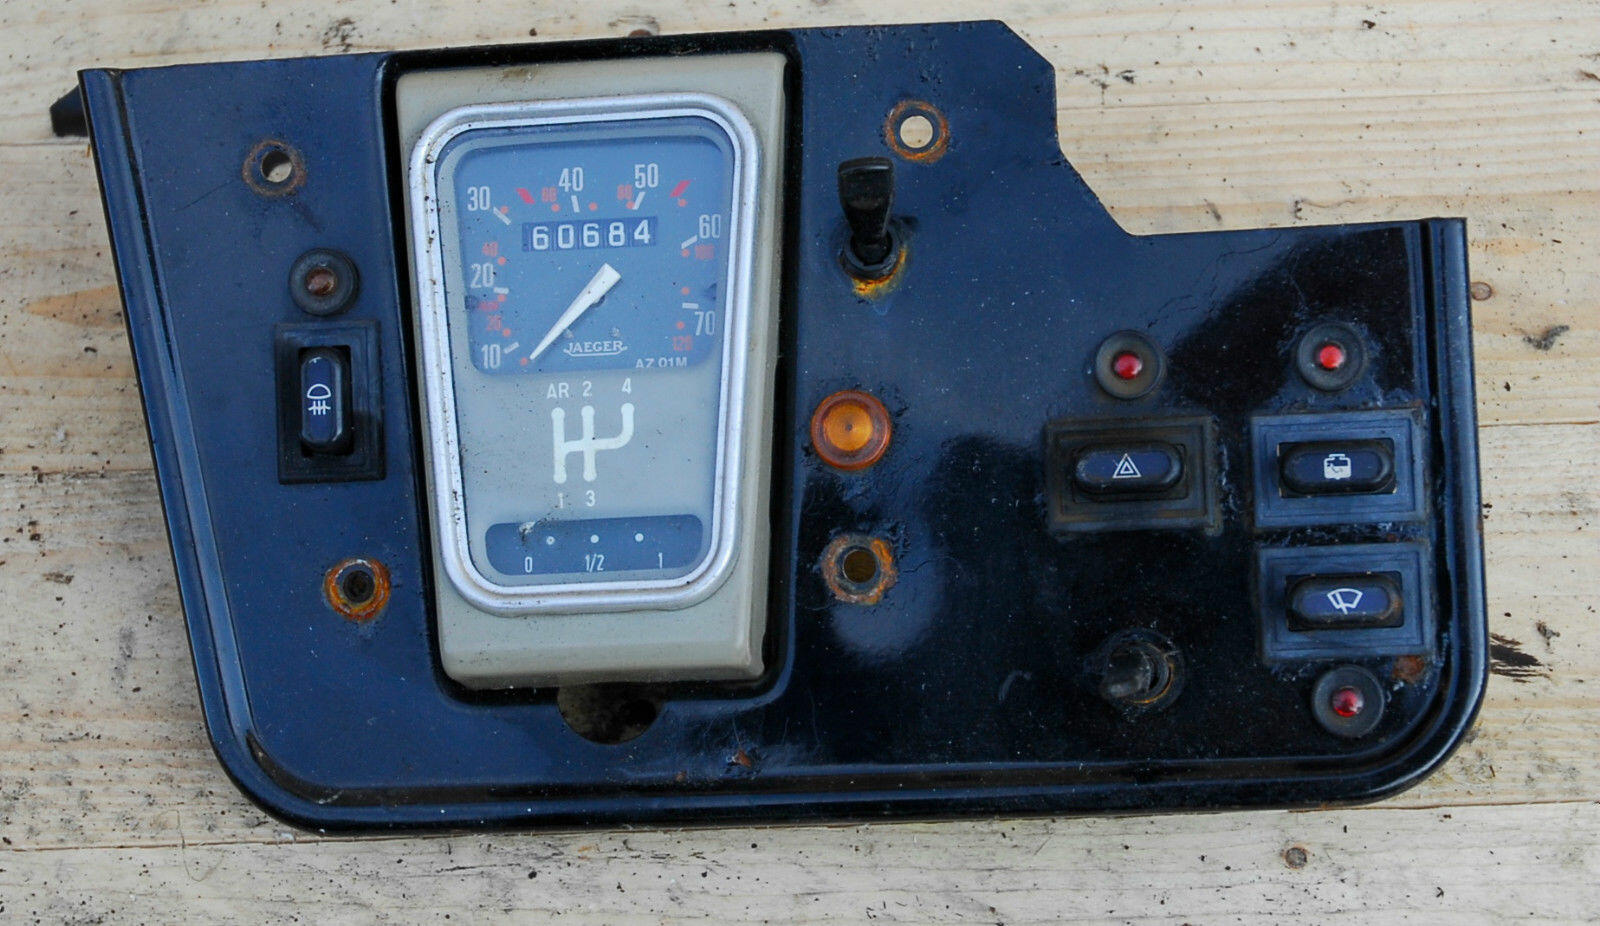 deconstructing 2cv dashboard indicator lights  u2013 colonel sponsz u0026 39 s shared items